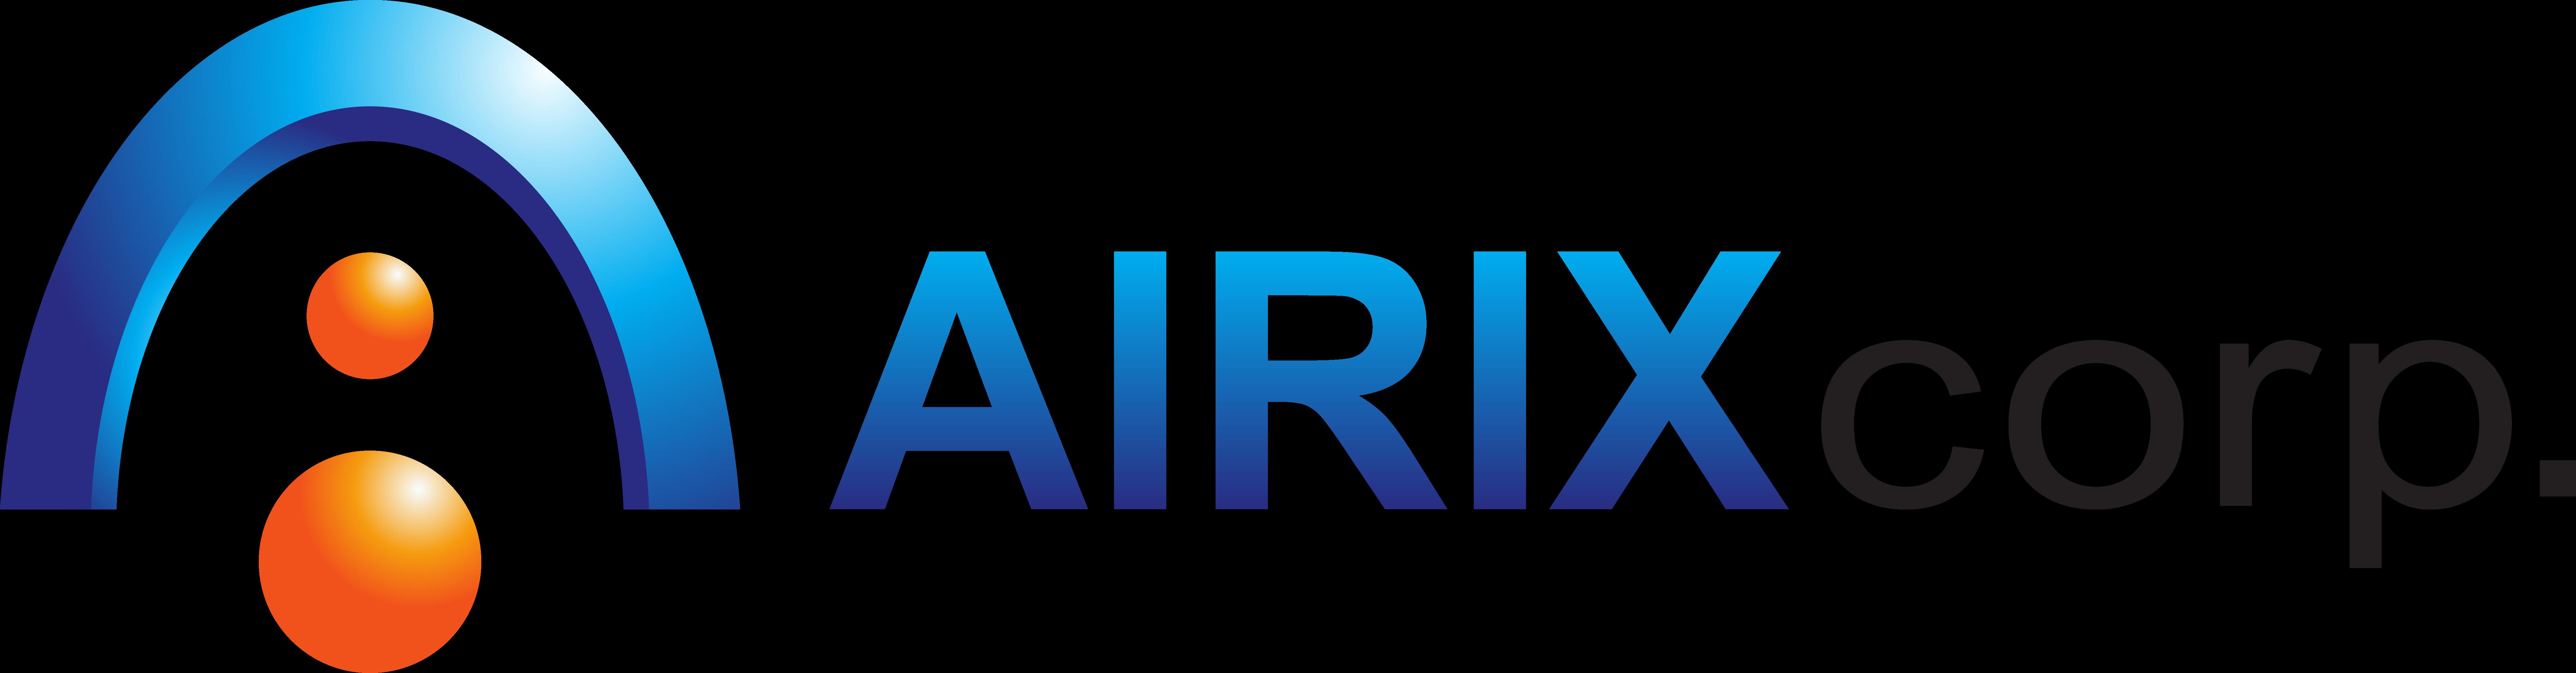 AIRIX Corp.